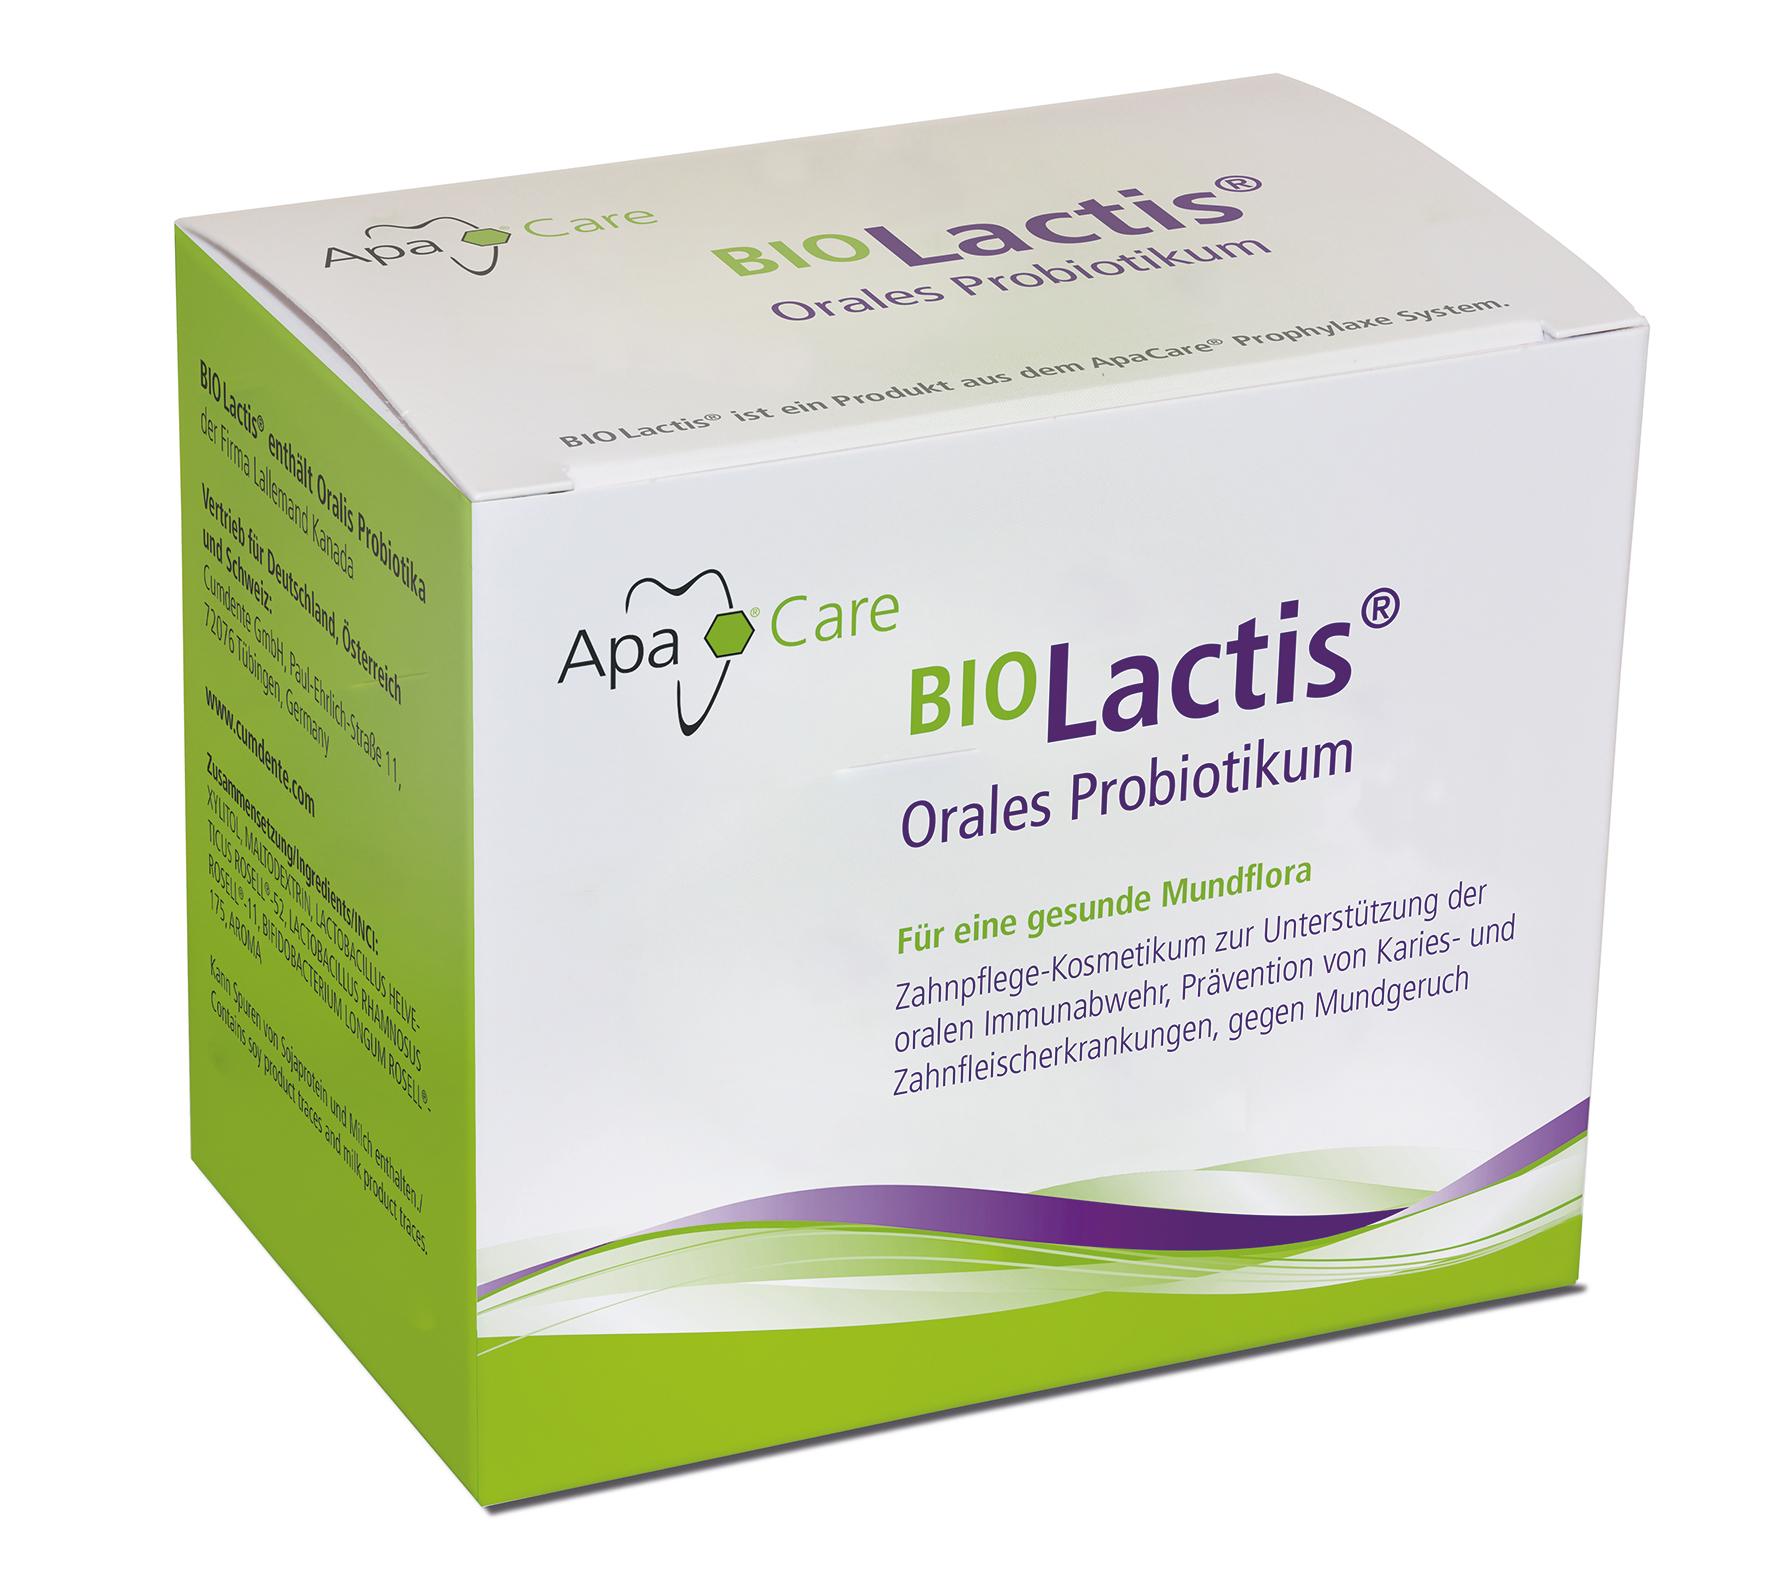 Orales Probiotikum